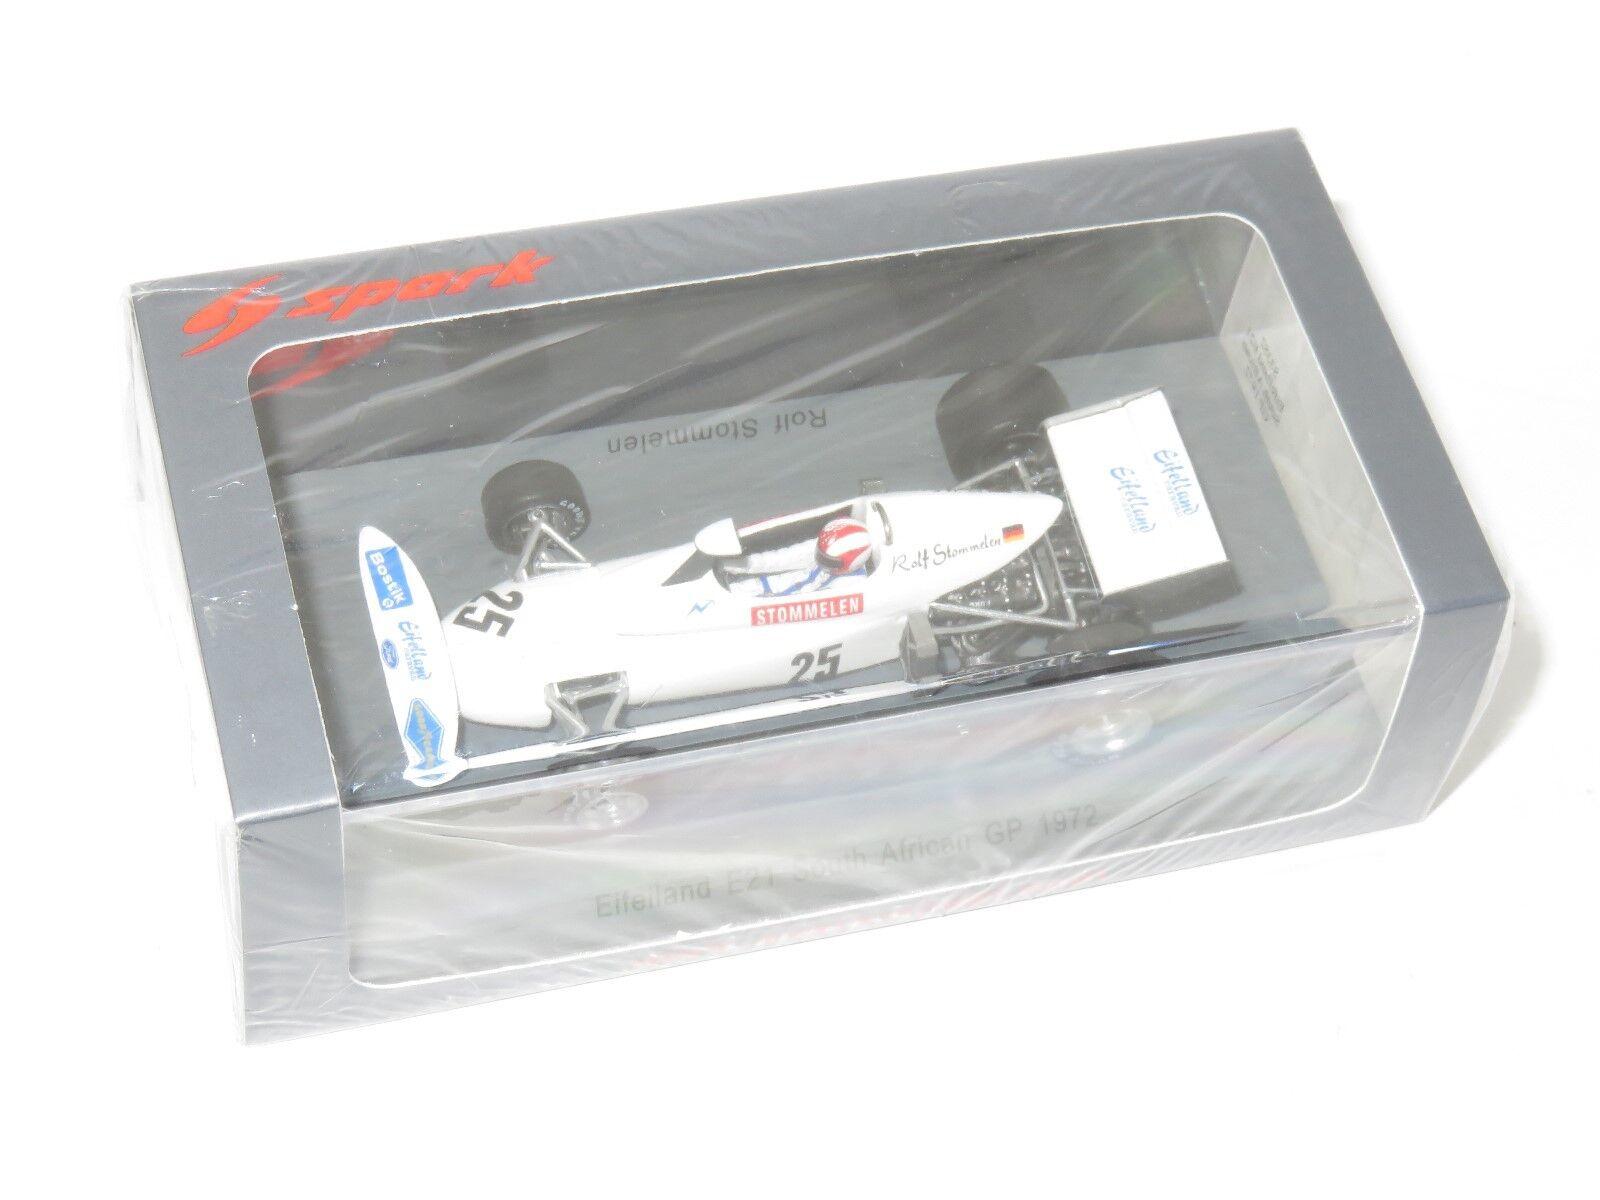 Spark MODEL Eifelland E21 de Sudáfrica GP 1972 25 Rolf Stommelen